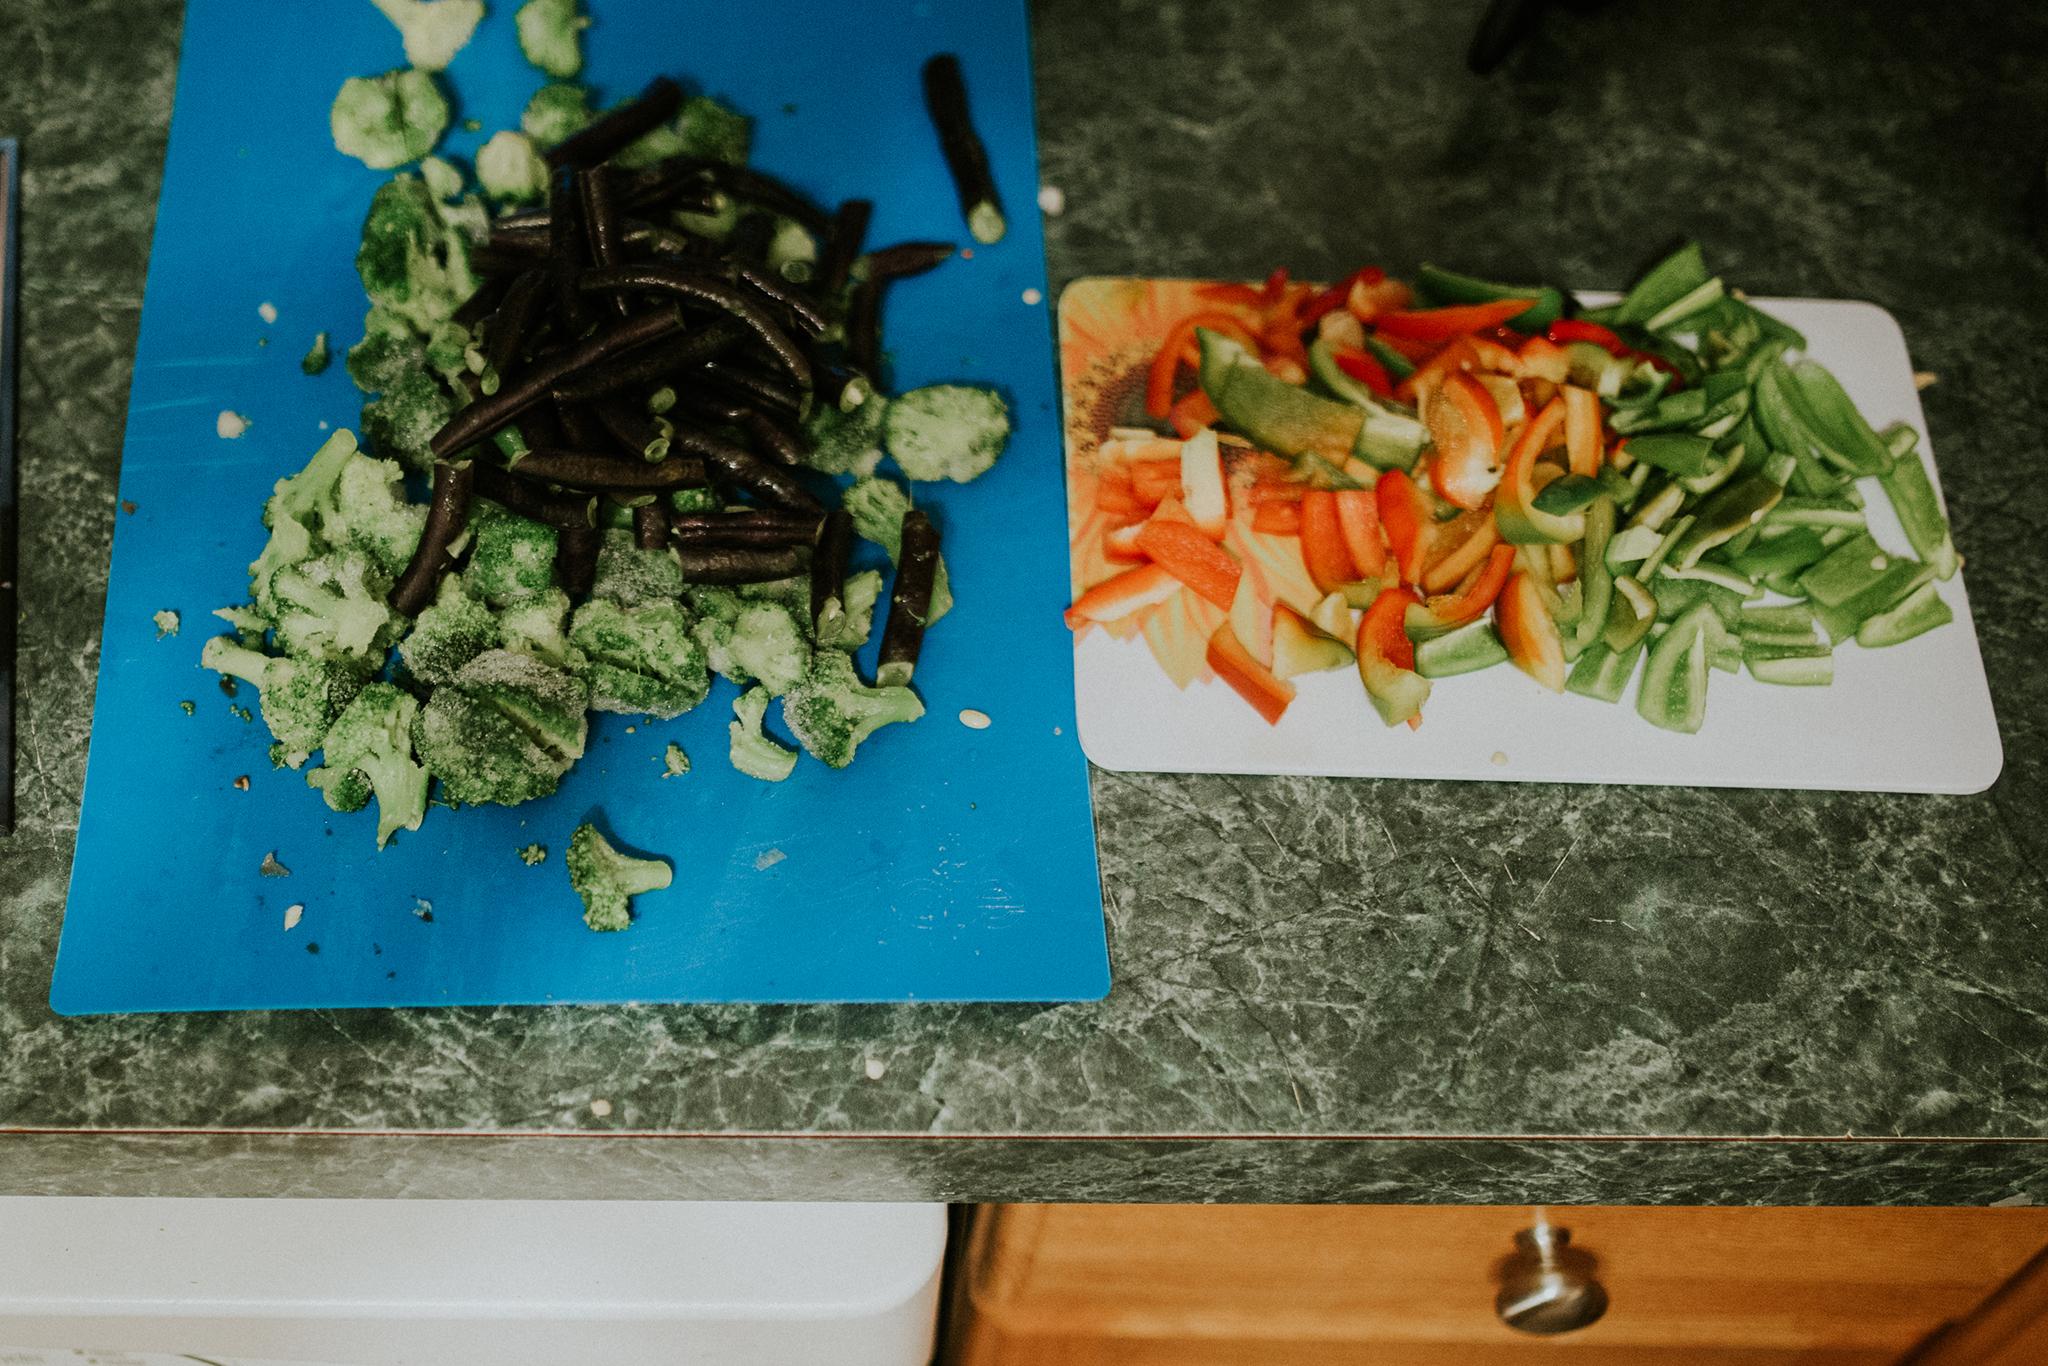 October 23: Post-wedding weekend eating all the veggies.